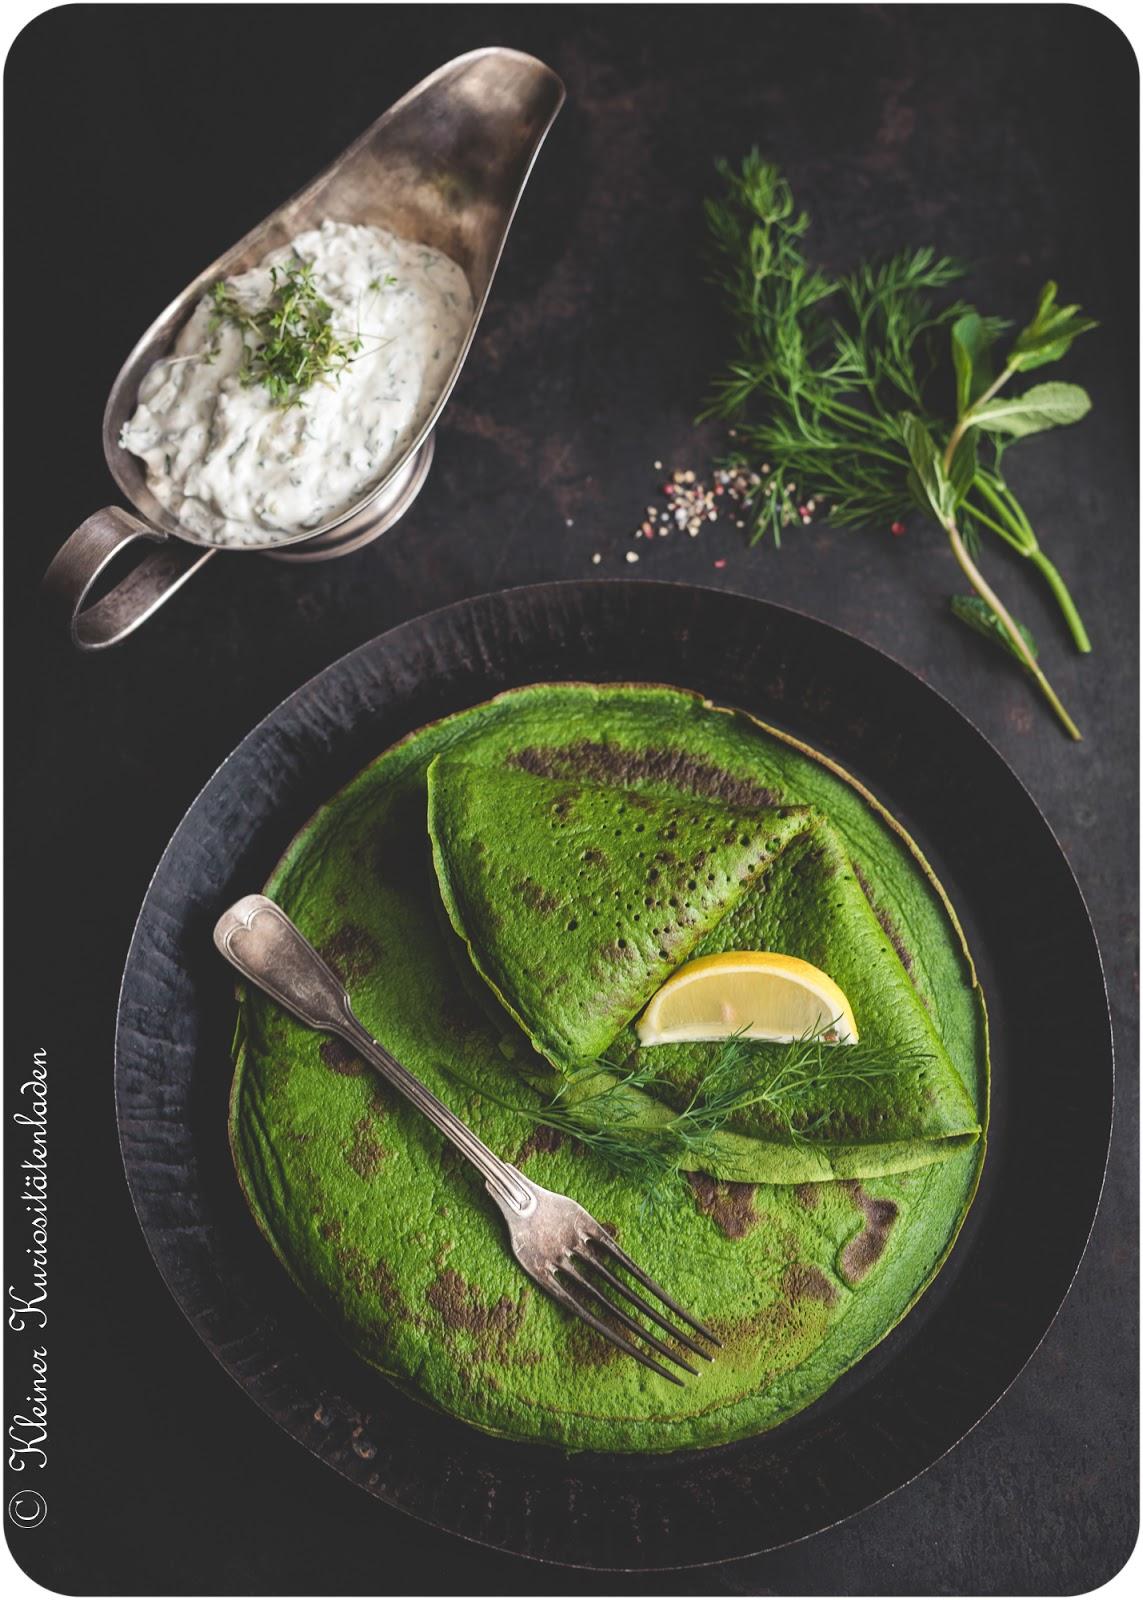 Spinatpfannkuchen mit Kräuterquark